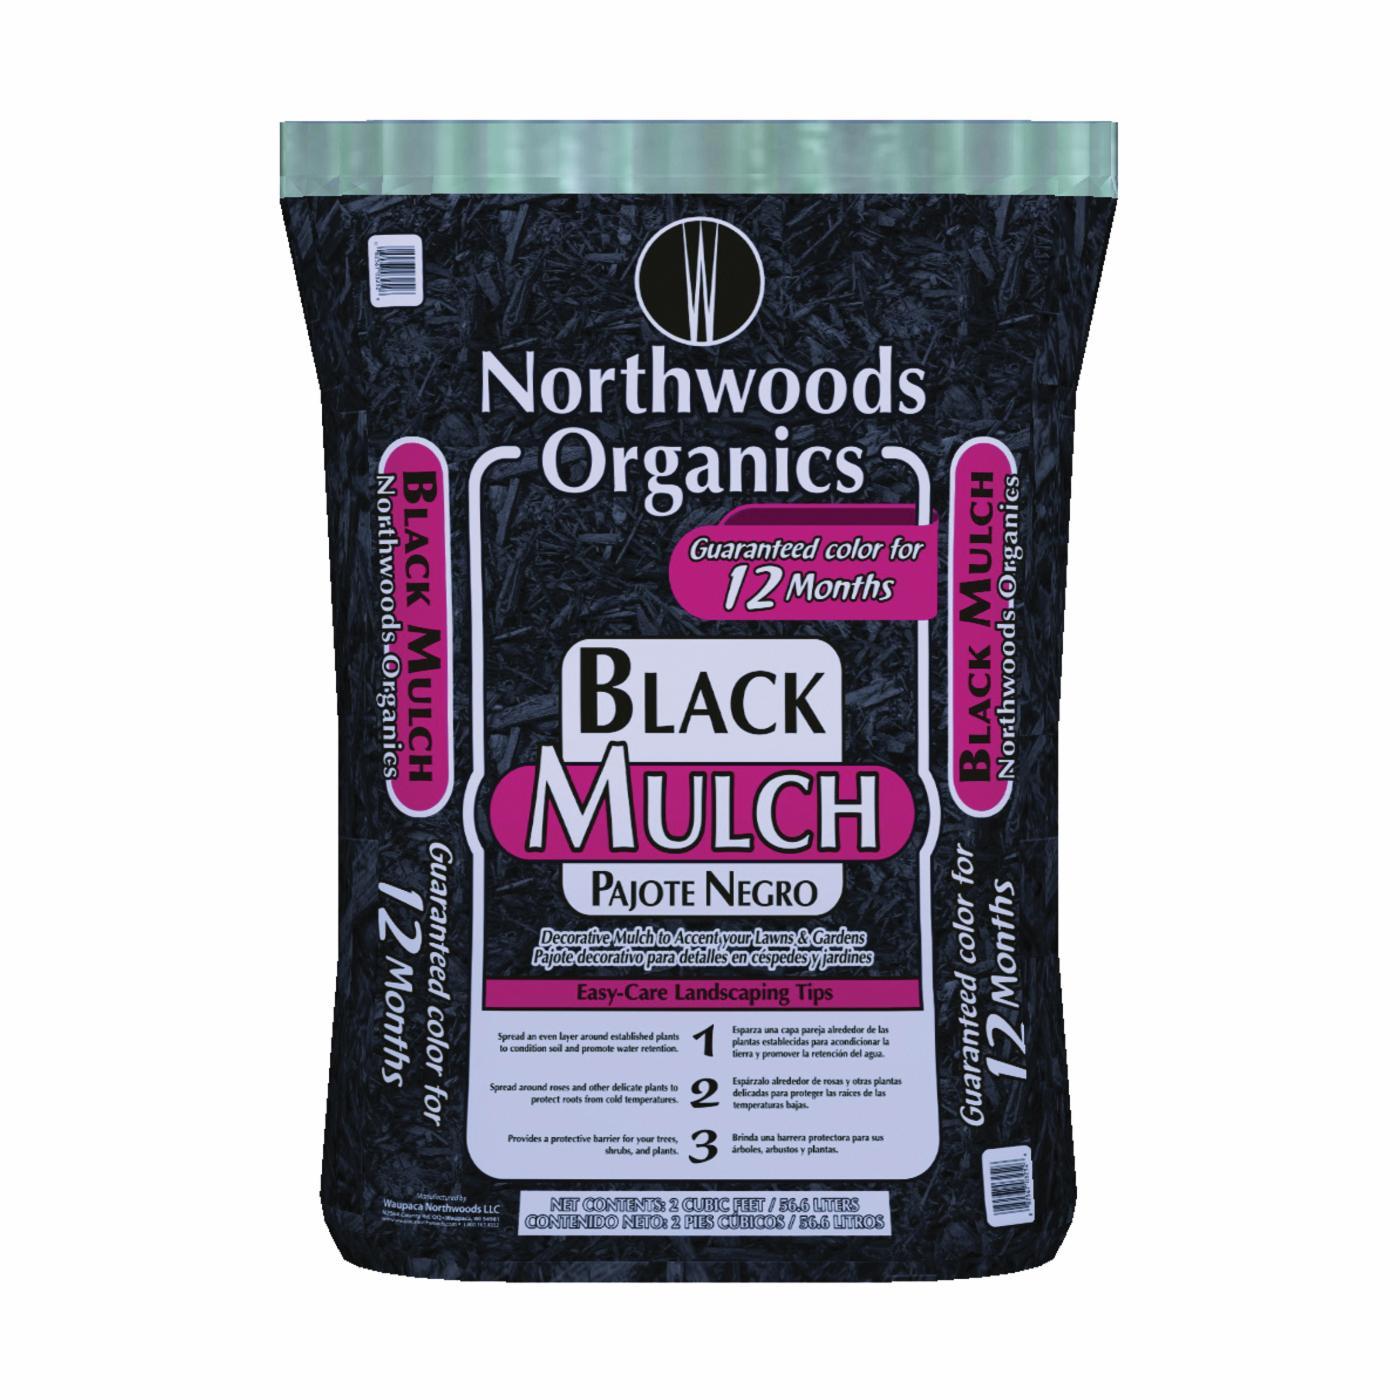 Northwoods Organics WNW03252